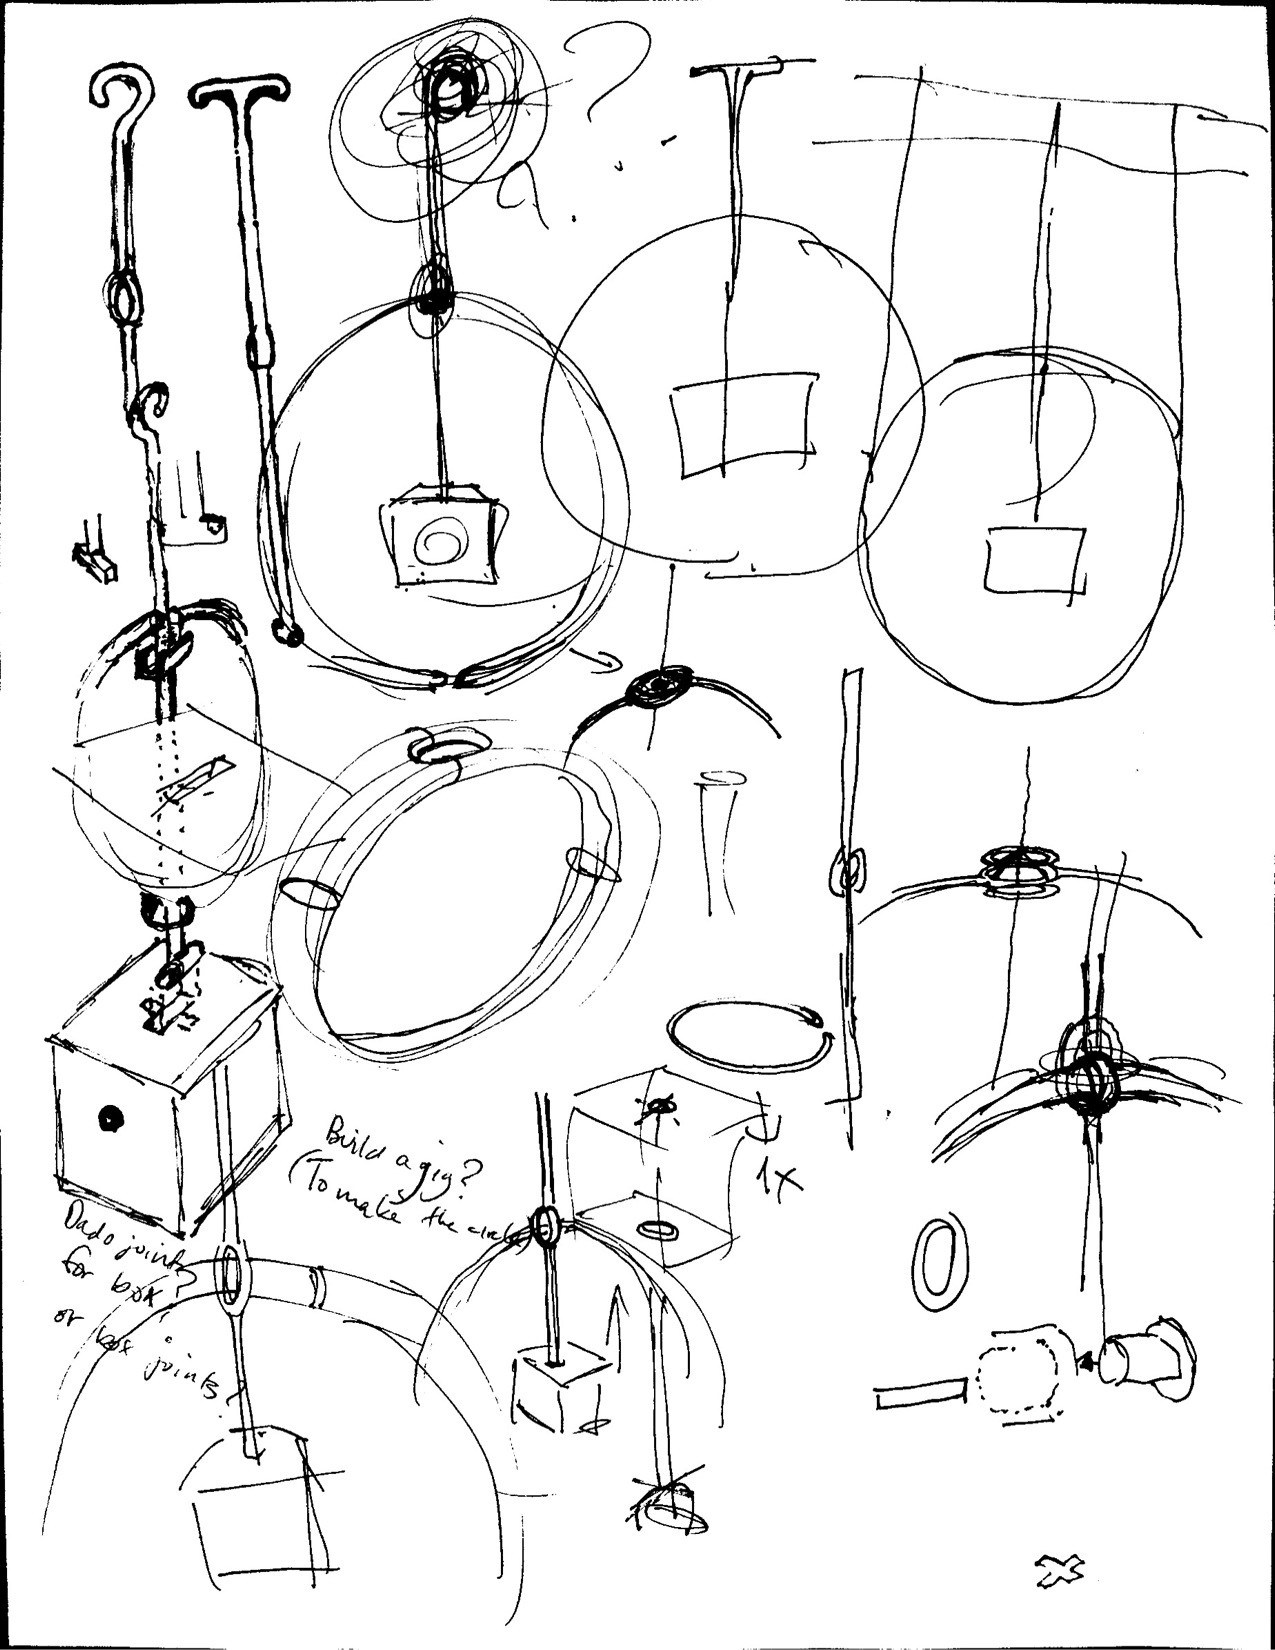 1275x1650 Finalizing Birdhouse Drawing Bird Choice Change Thad Deus